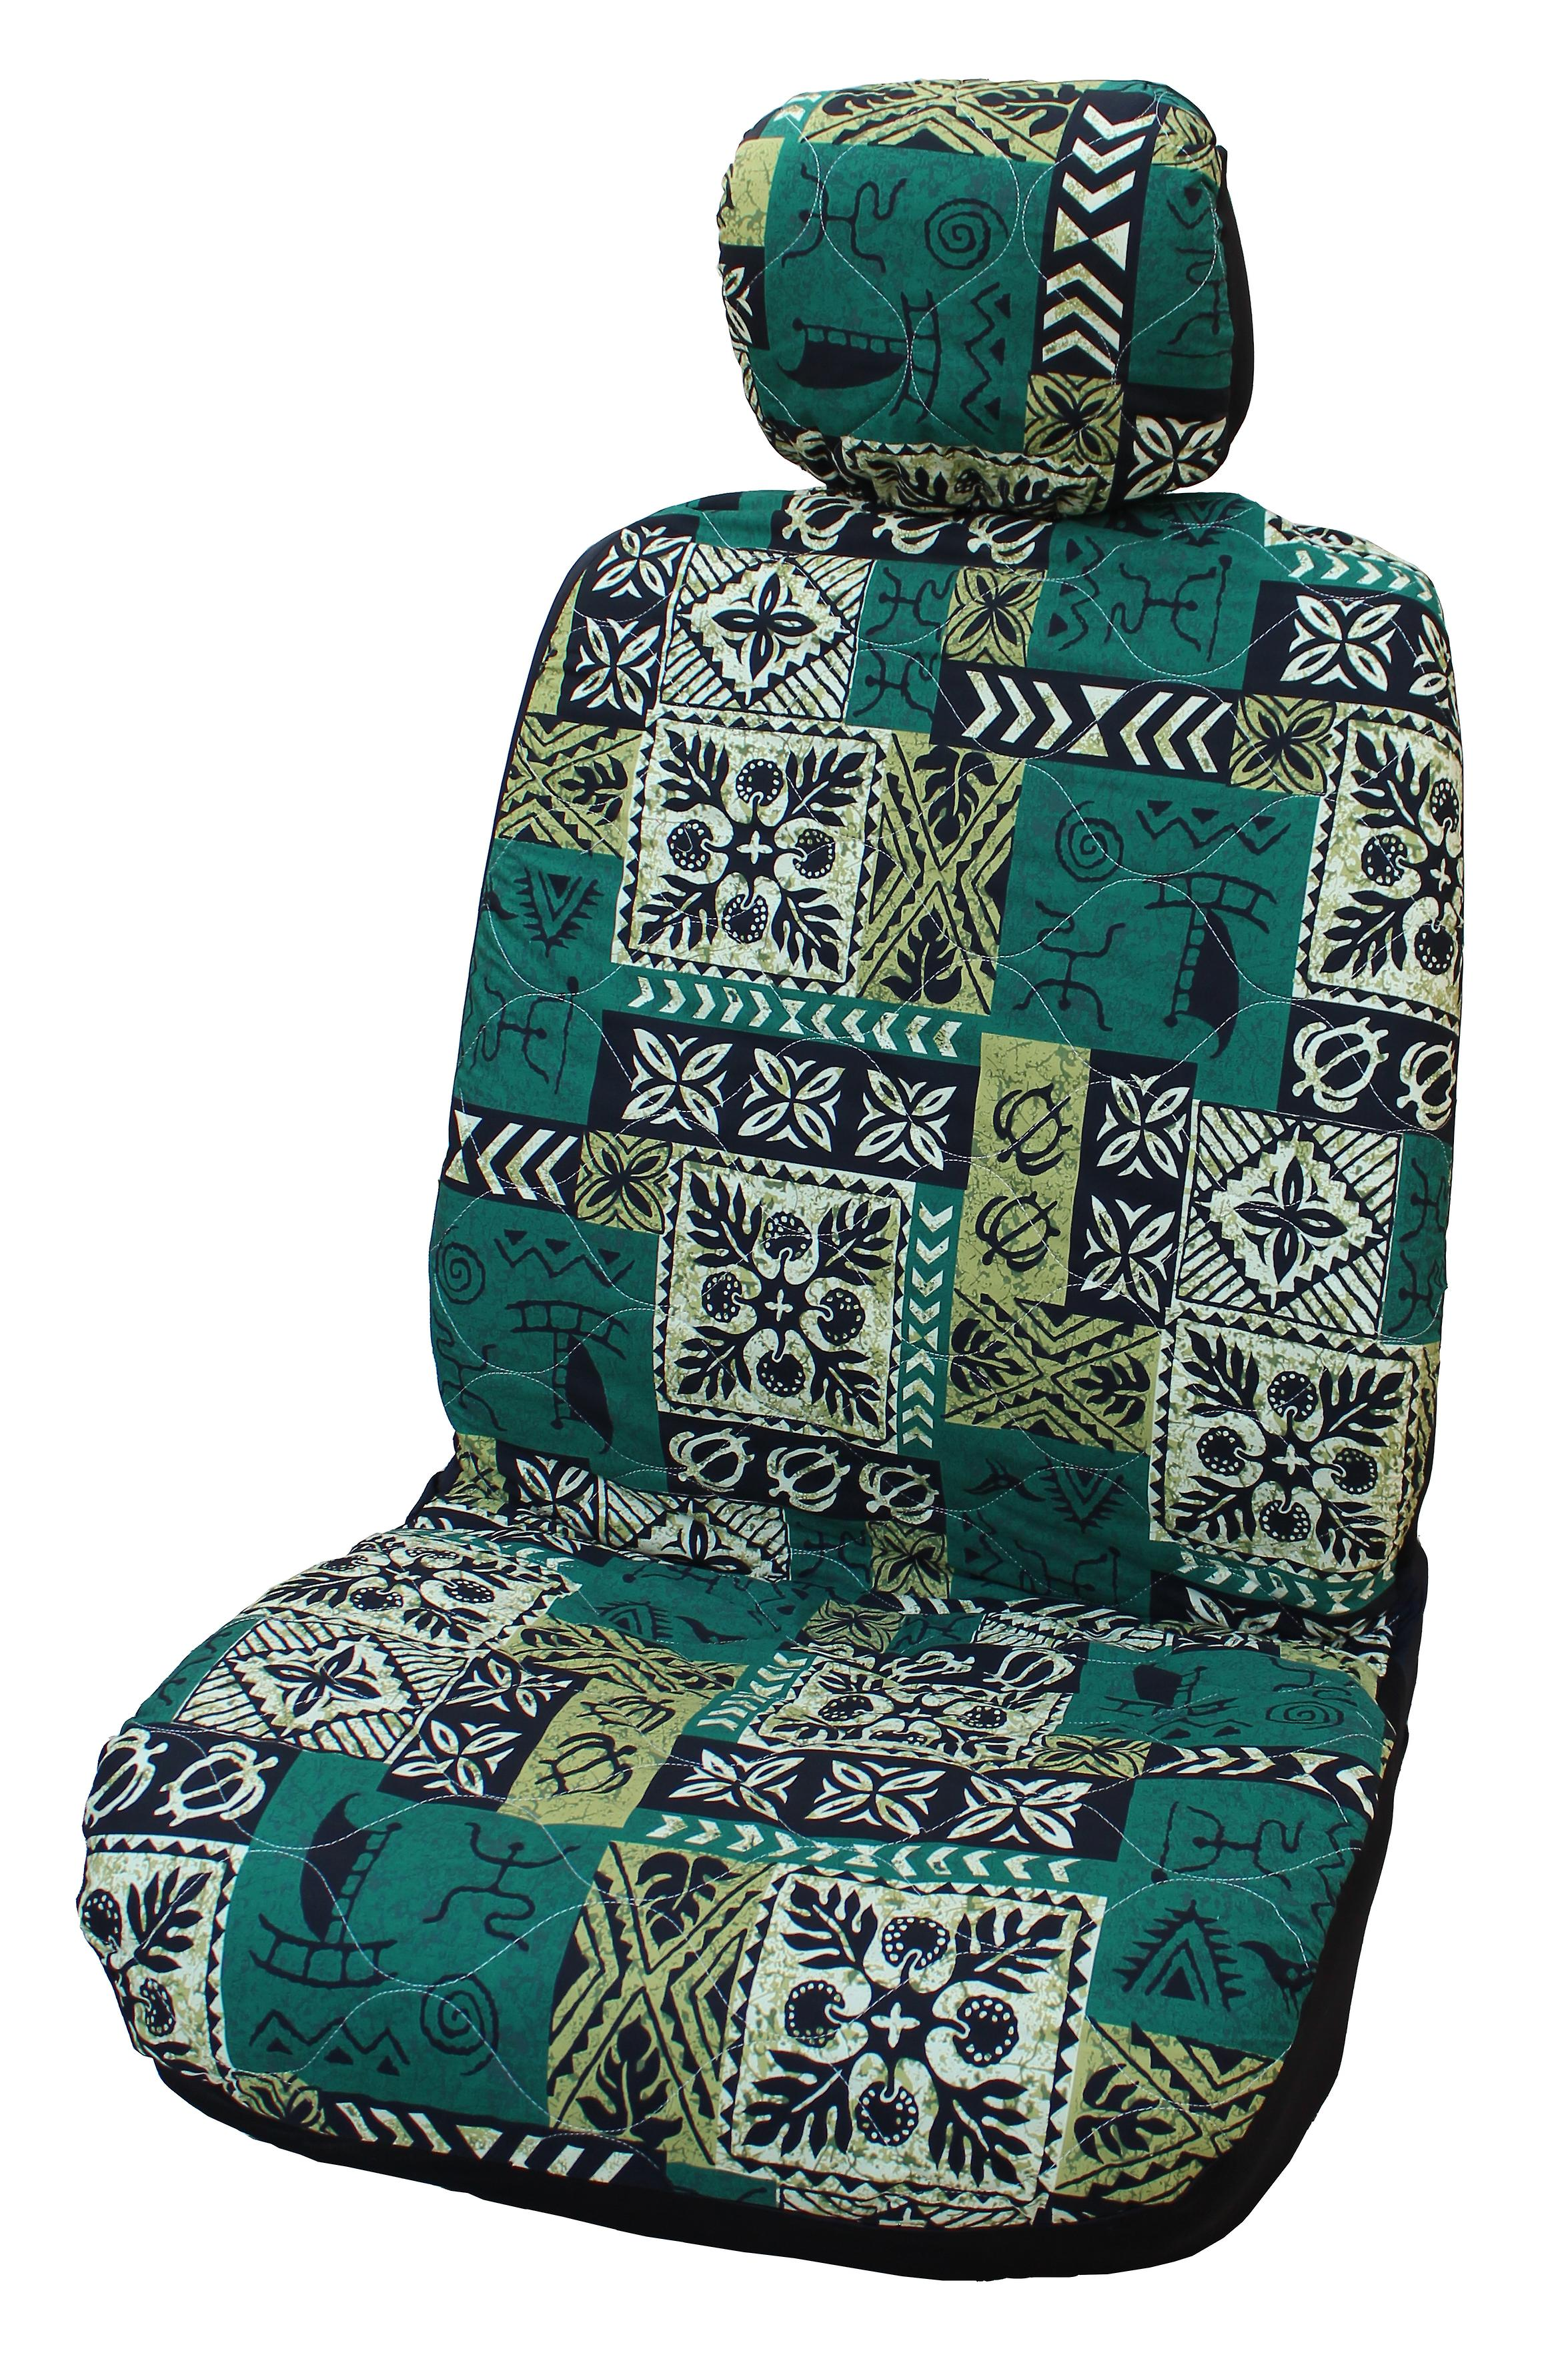 Hawaiian Car Seat Covers >> Side Airbag Optional Old Tapa Separate Headrests Hawaiian Car Seat Covers